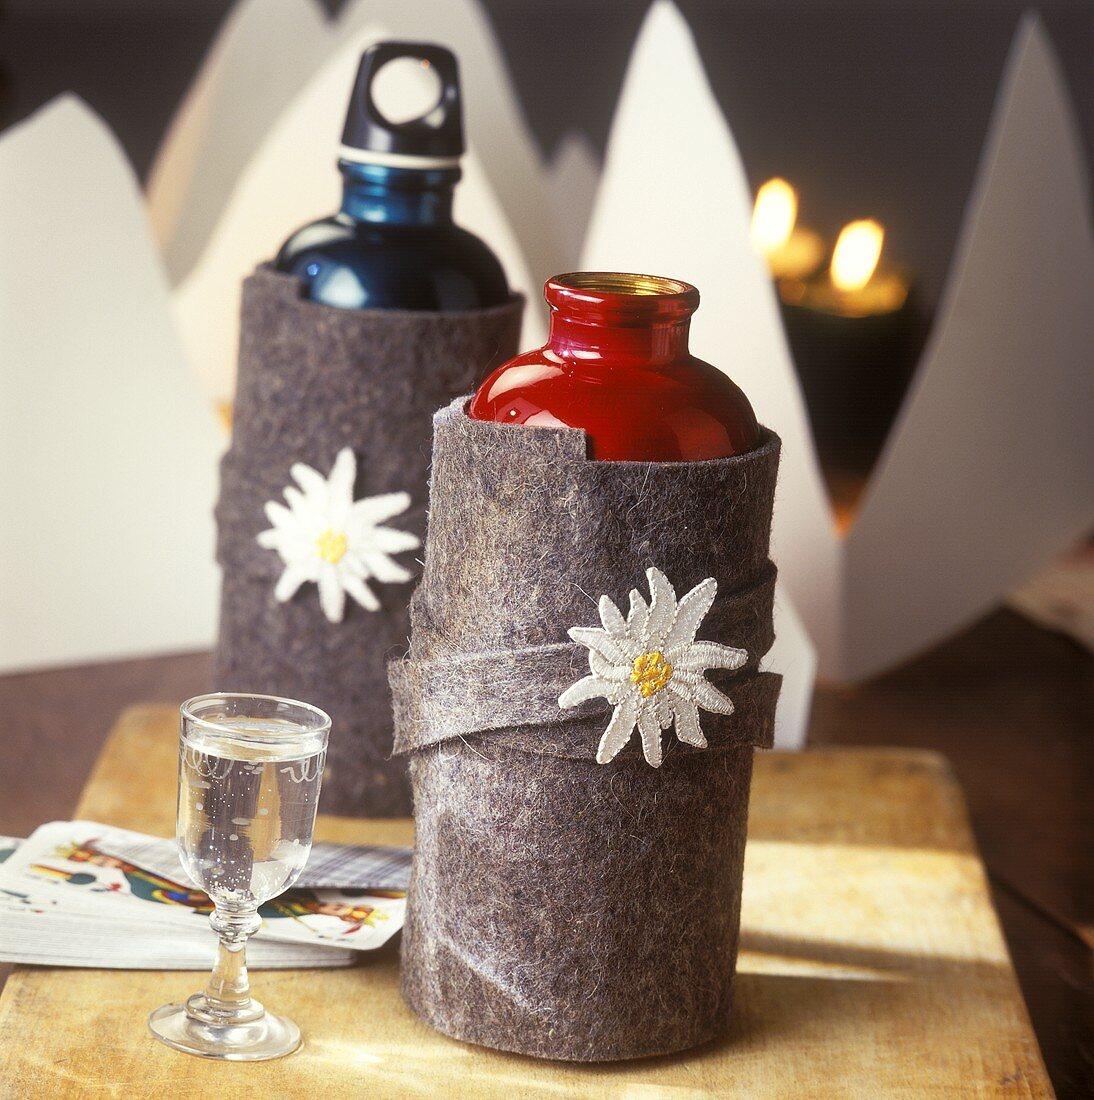 Sports bottles in felt case & schnapps glass, chalet evening